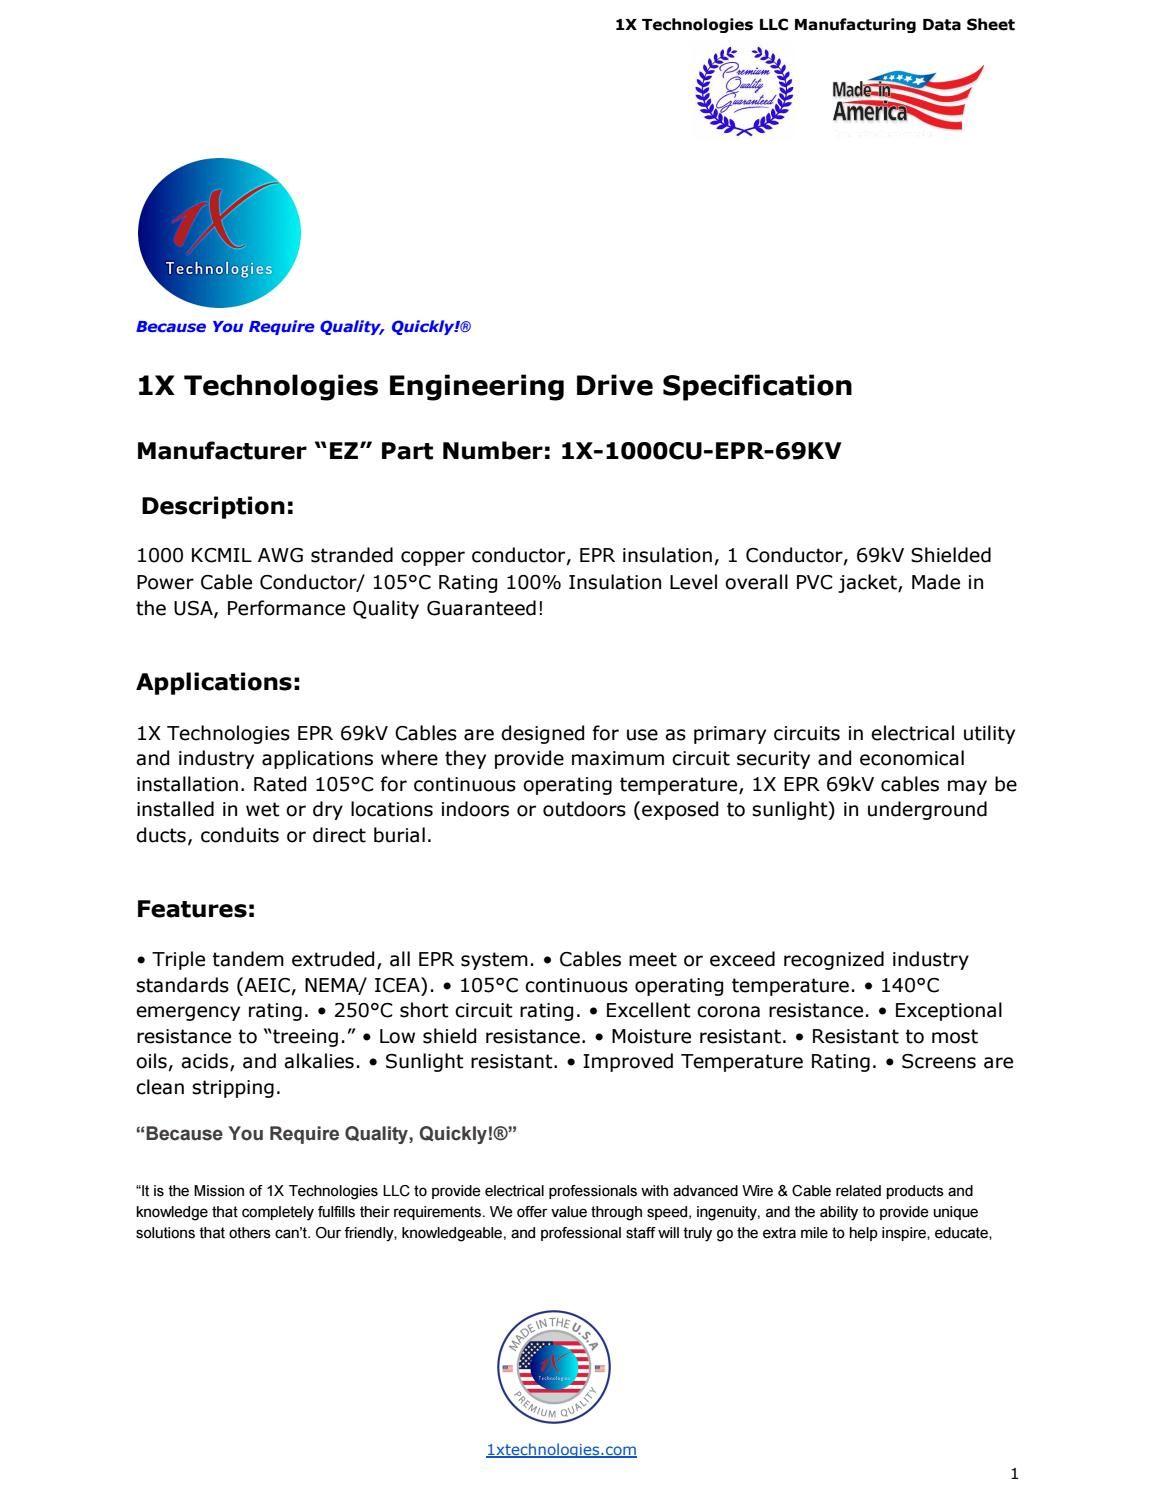 1000 mcm cu epr 69kv 1x technologies engineering drive specification 1000 mcm cu epr 69kv 1x technologies engineering drive specification greentooth Images